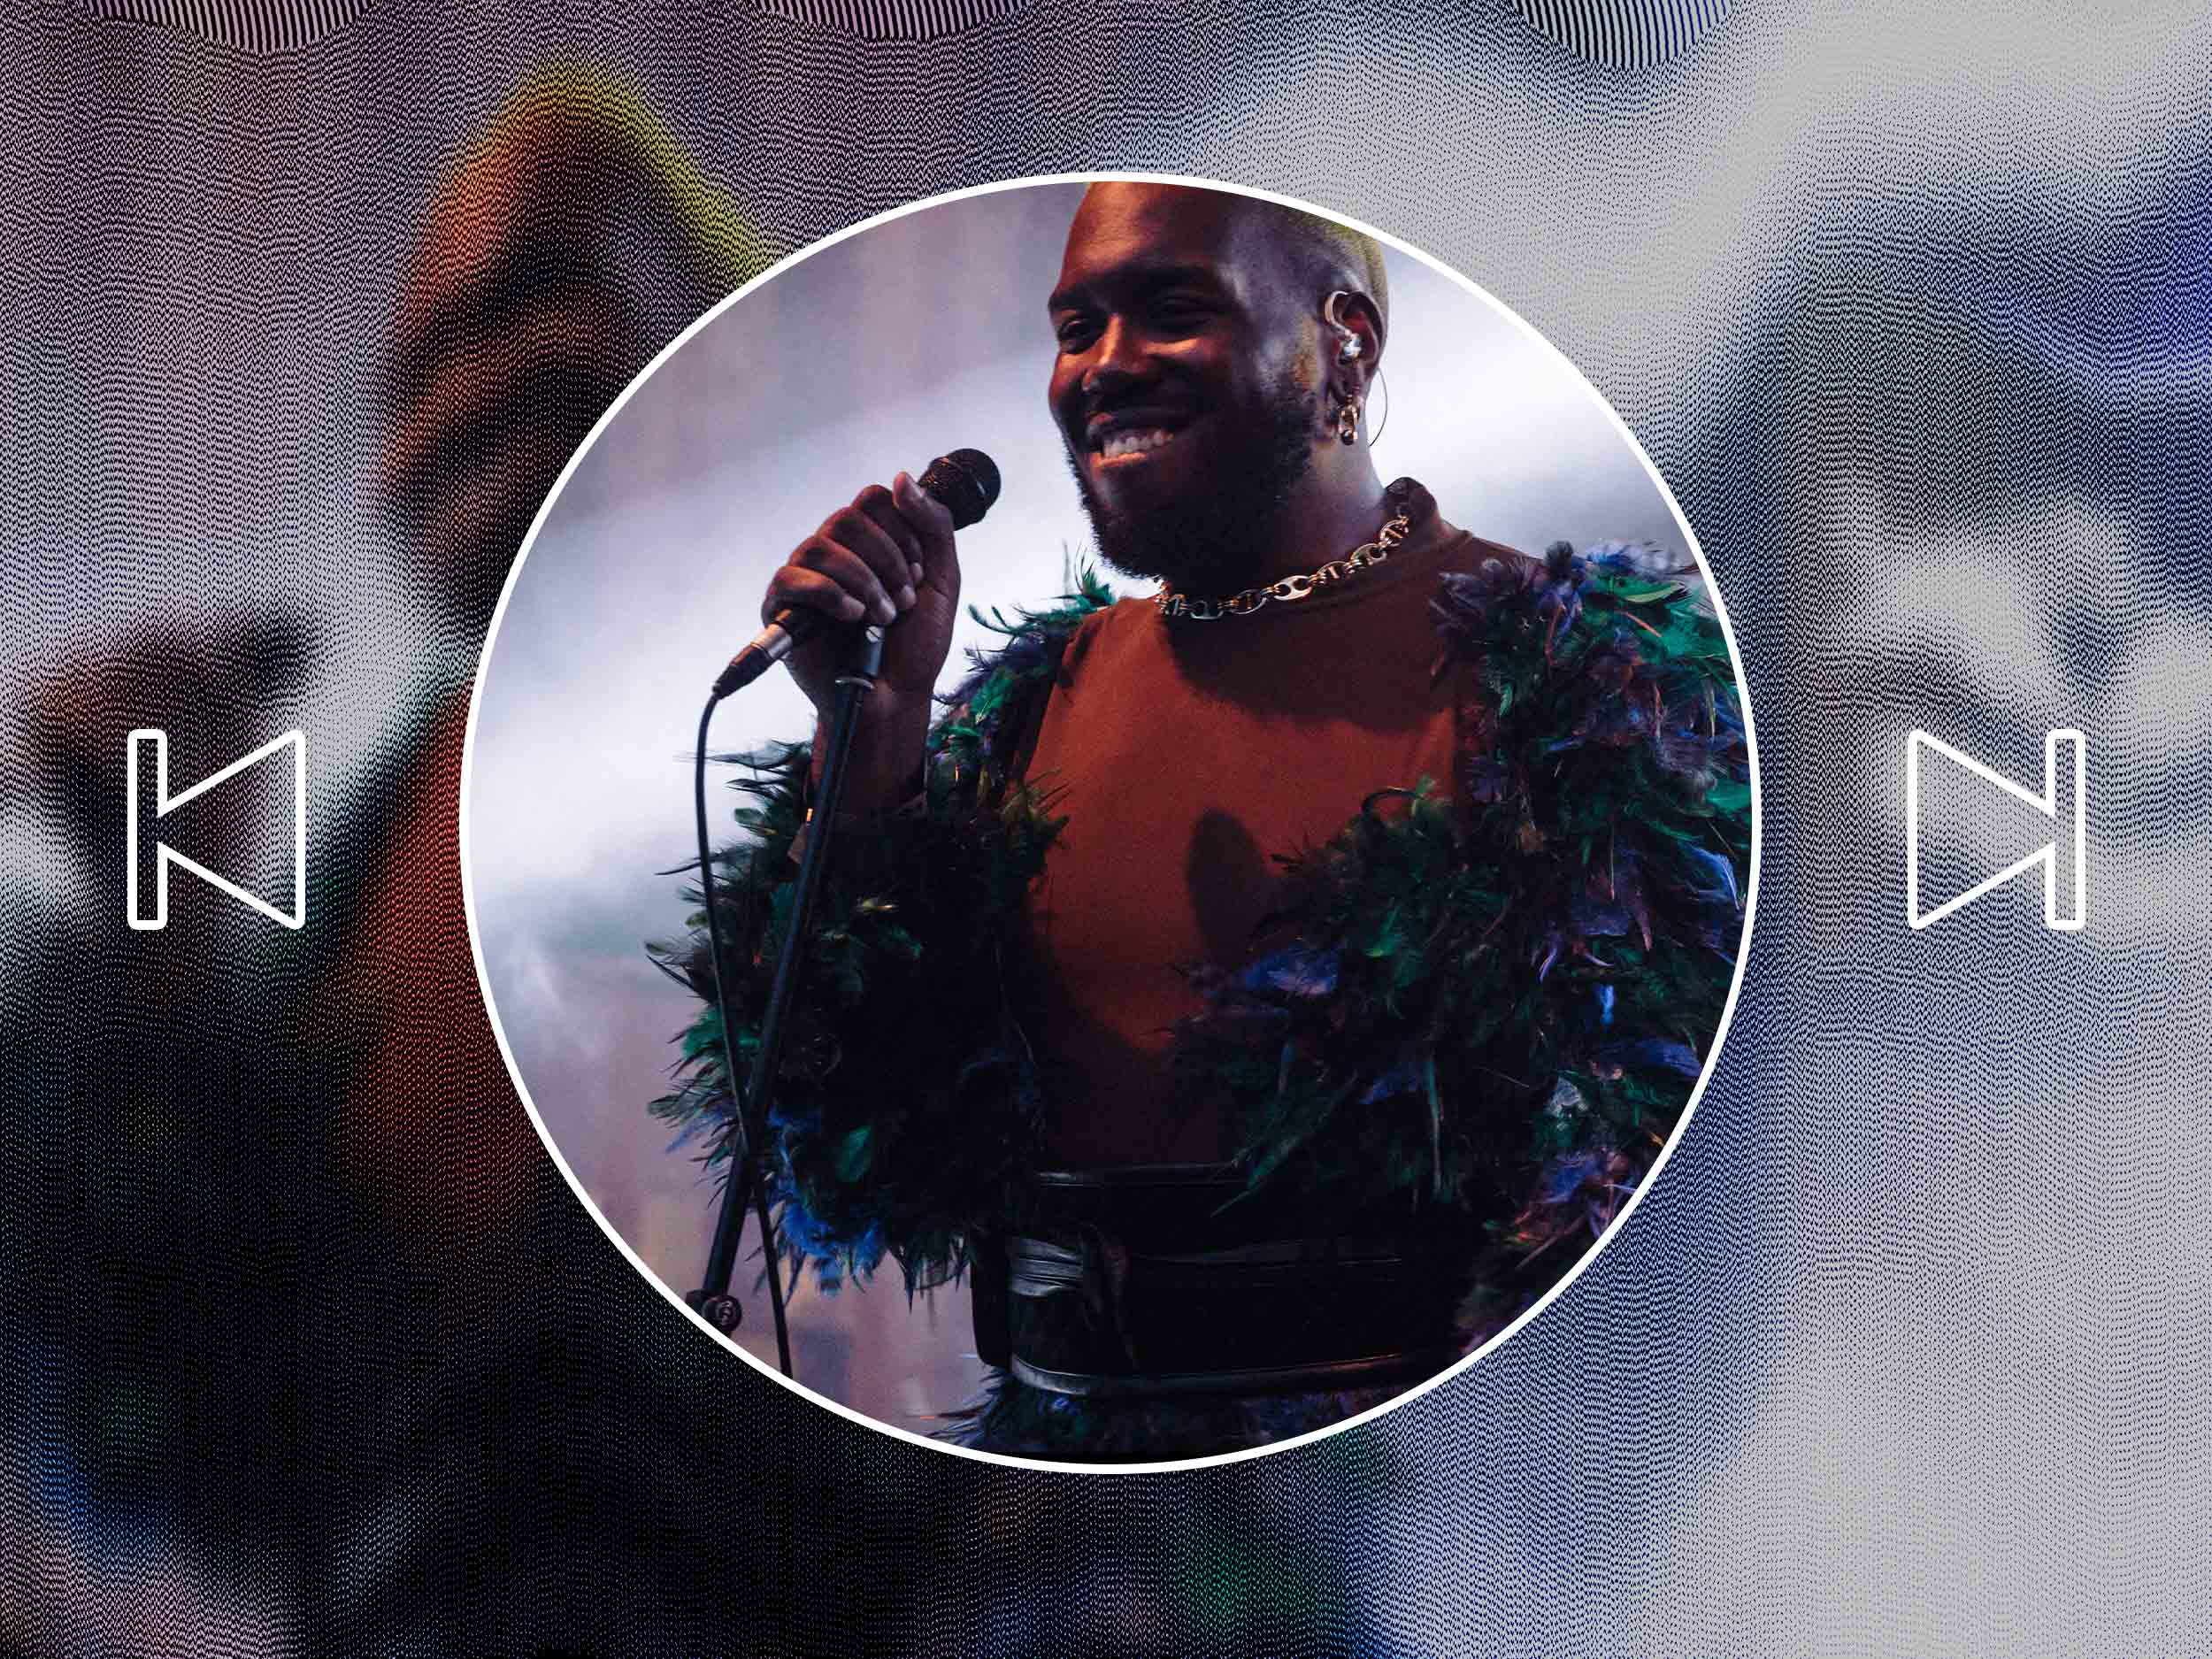 French ballroom icon Kiddy Smile picks his 6 favorite house anthems